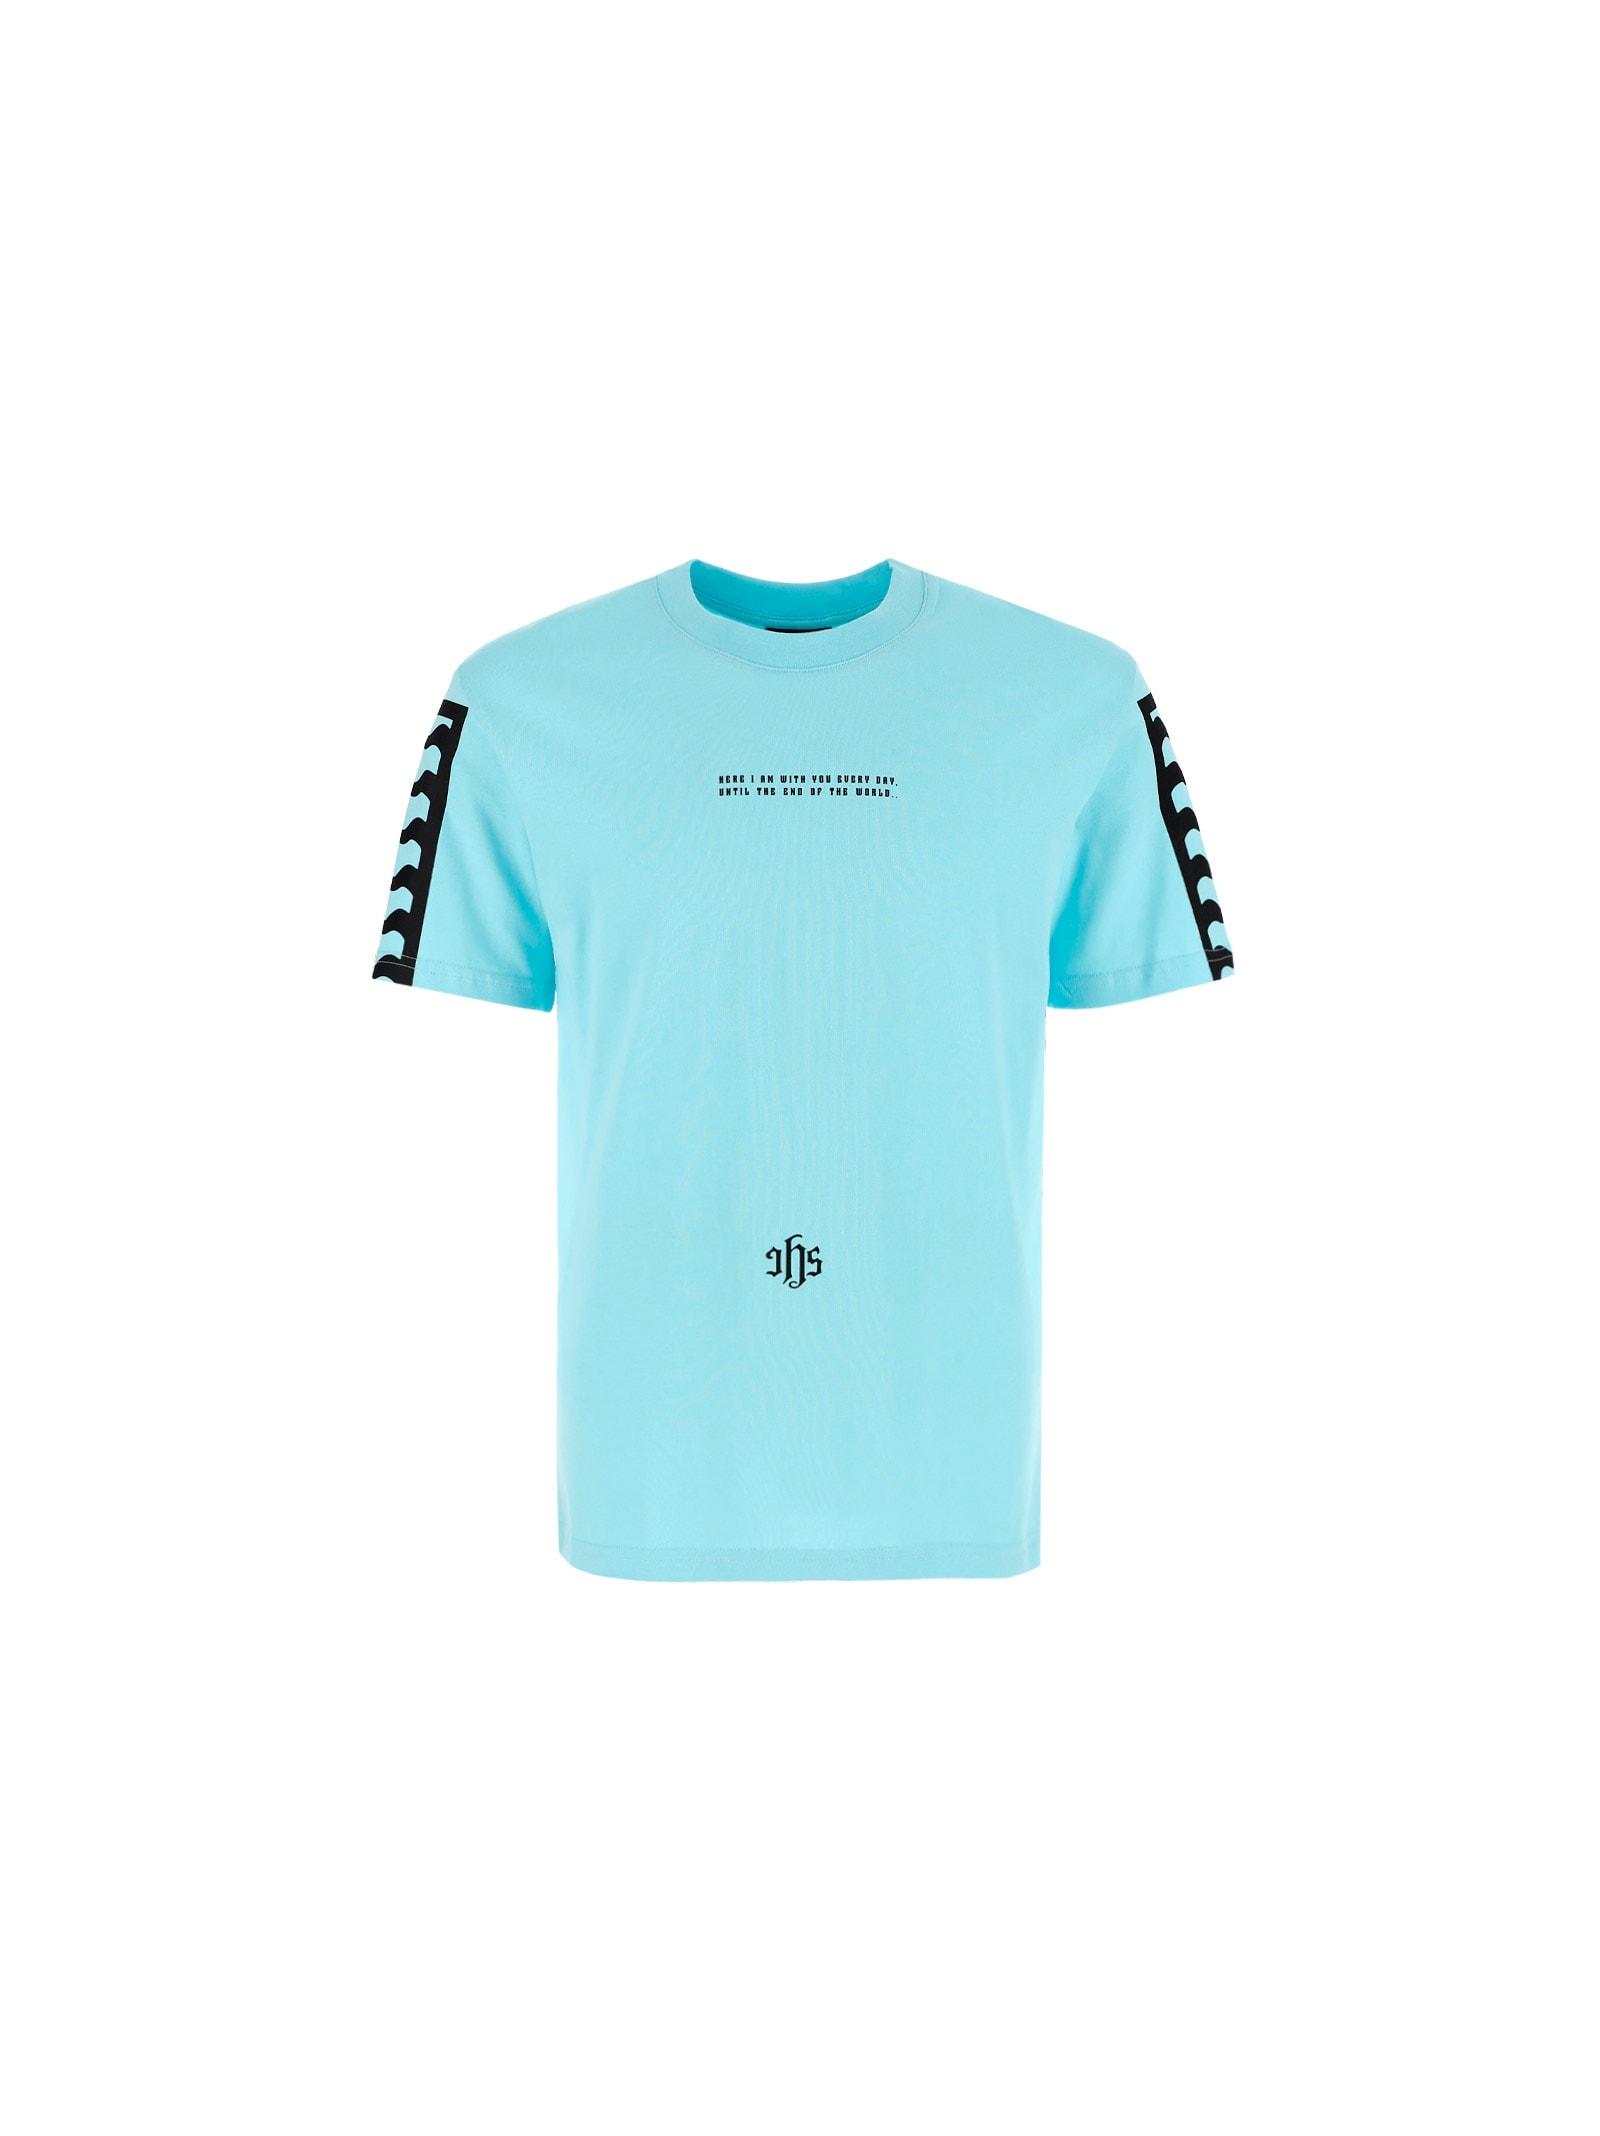 Arcangelo T-shirt